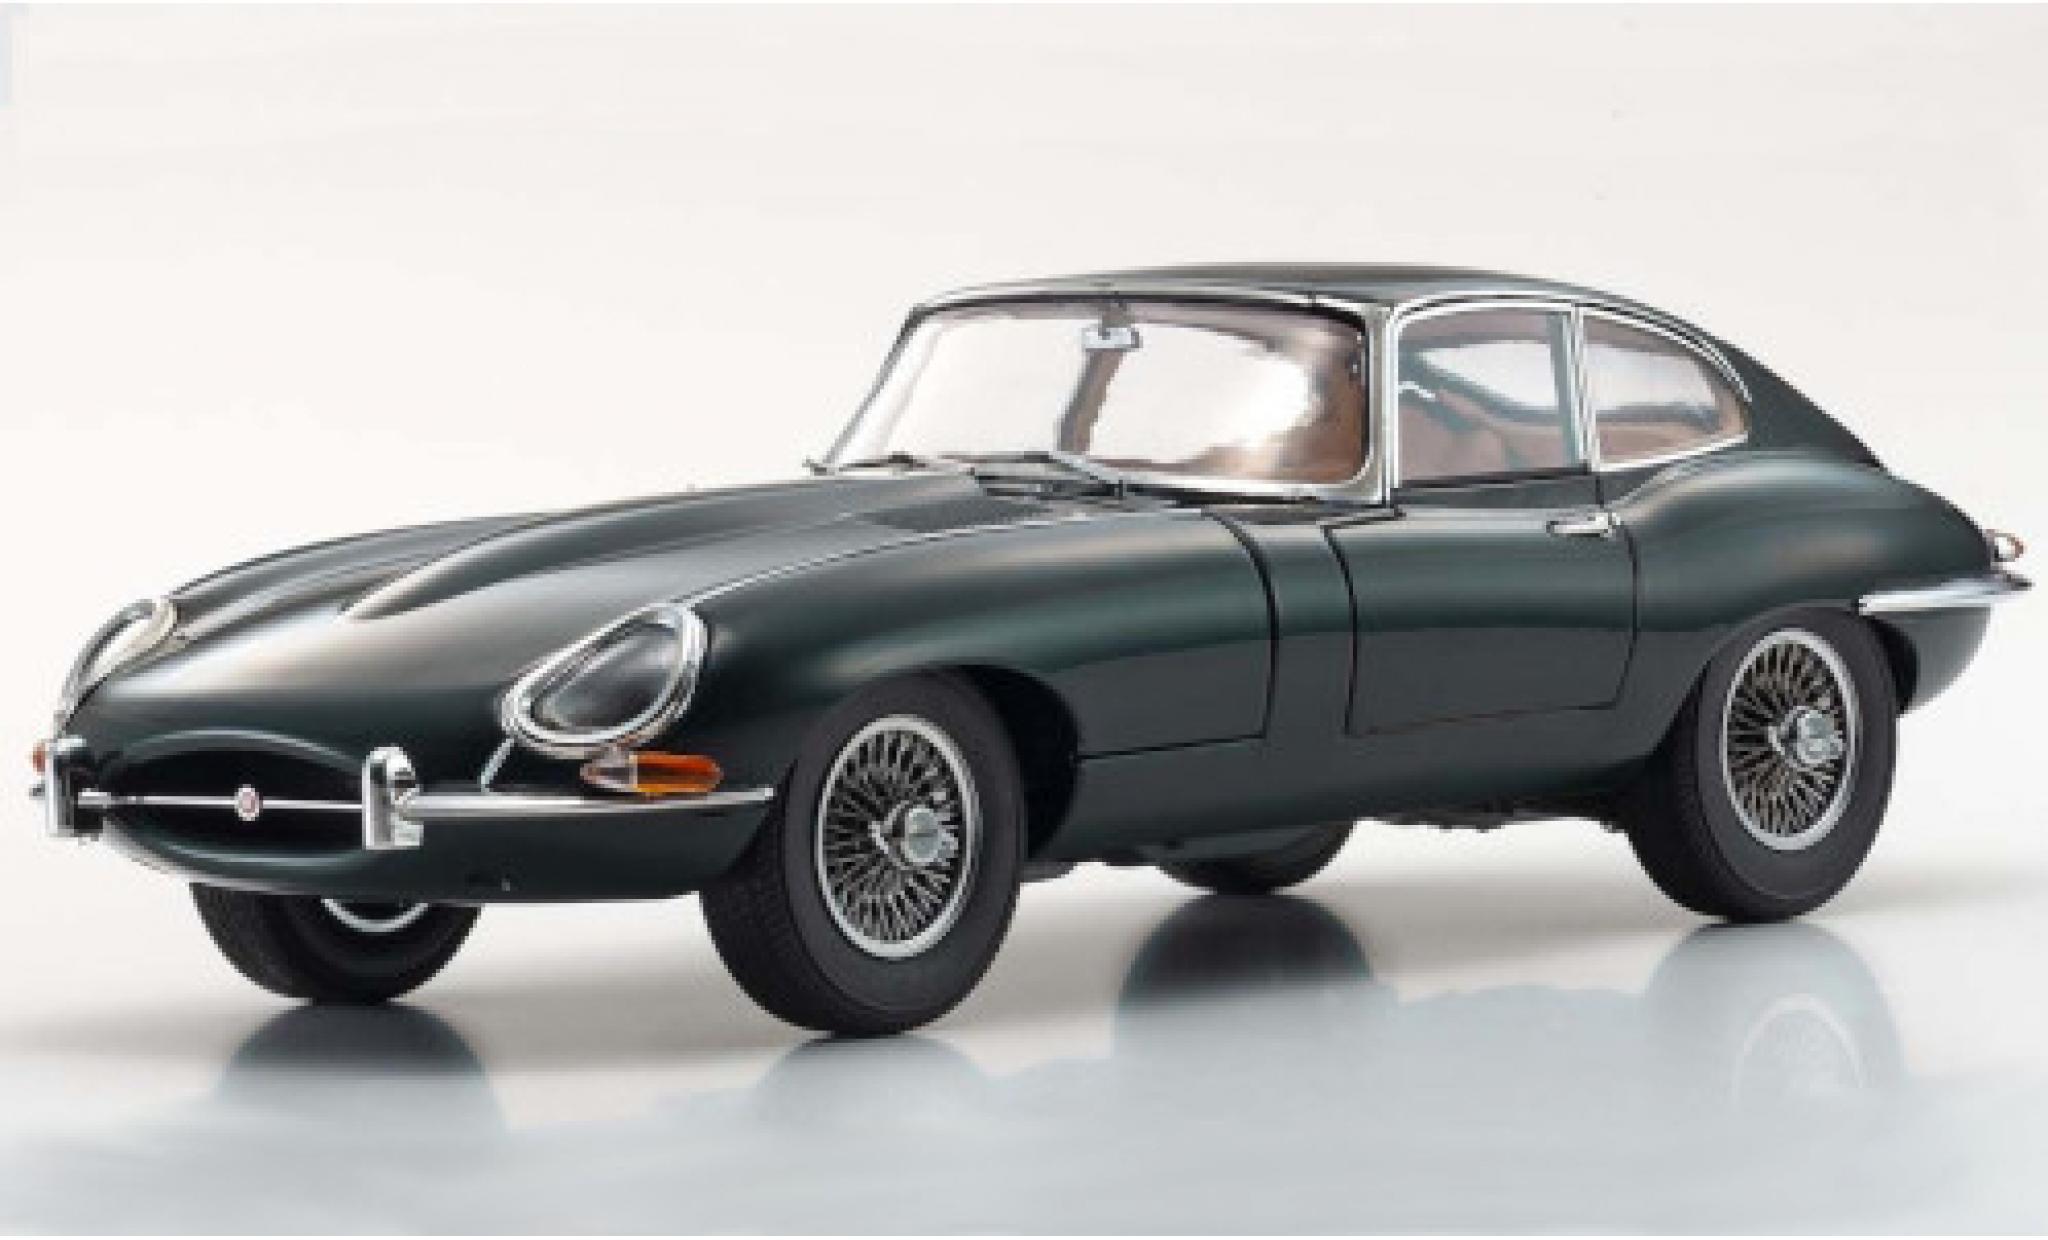 Jaguar E-Type 1/18 Kyosho Series I green RHD 1961